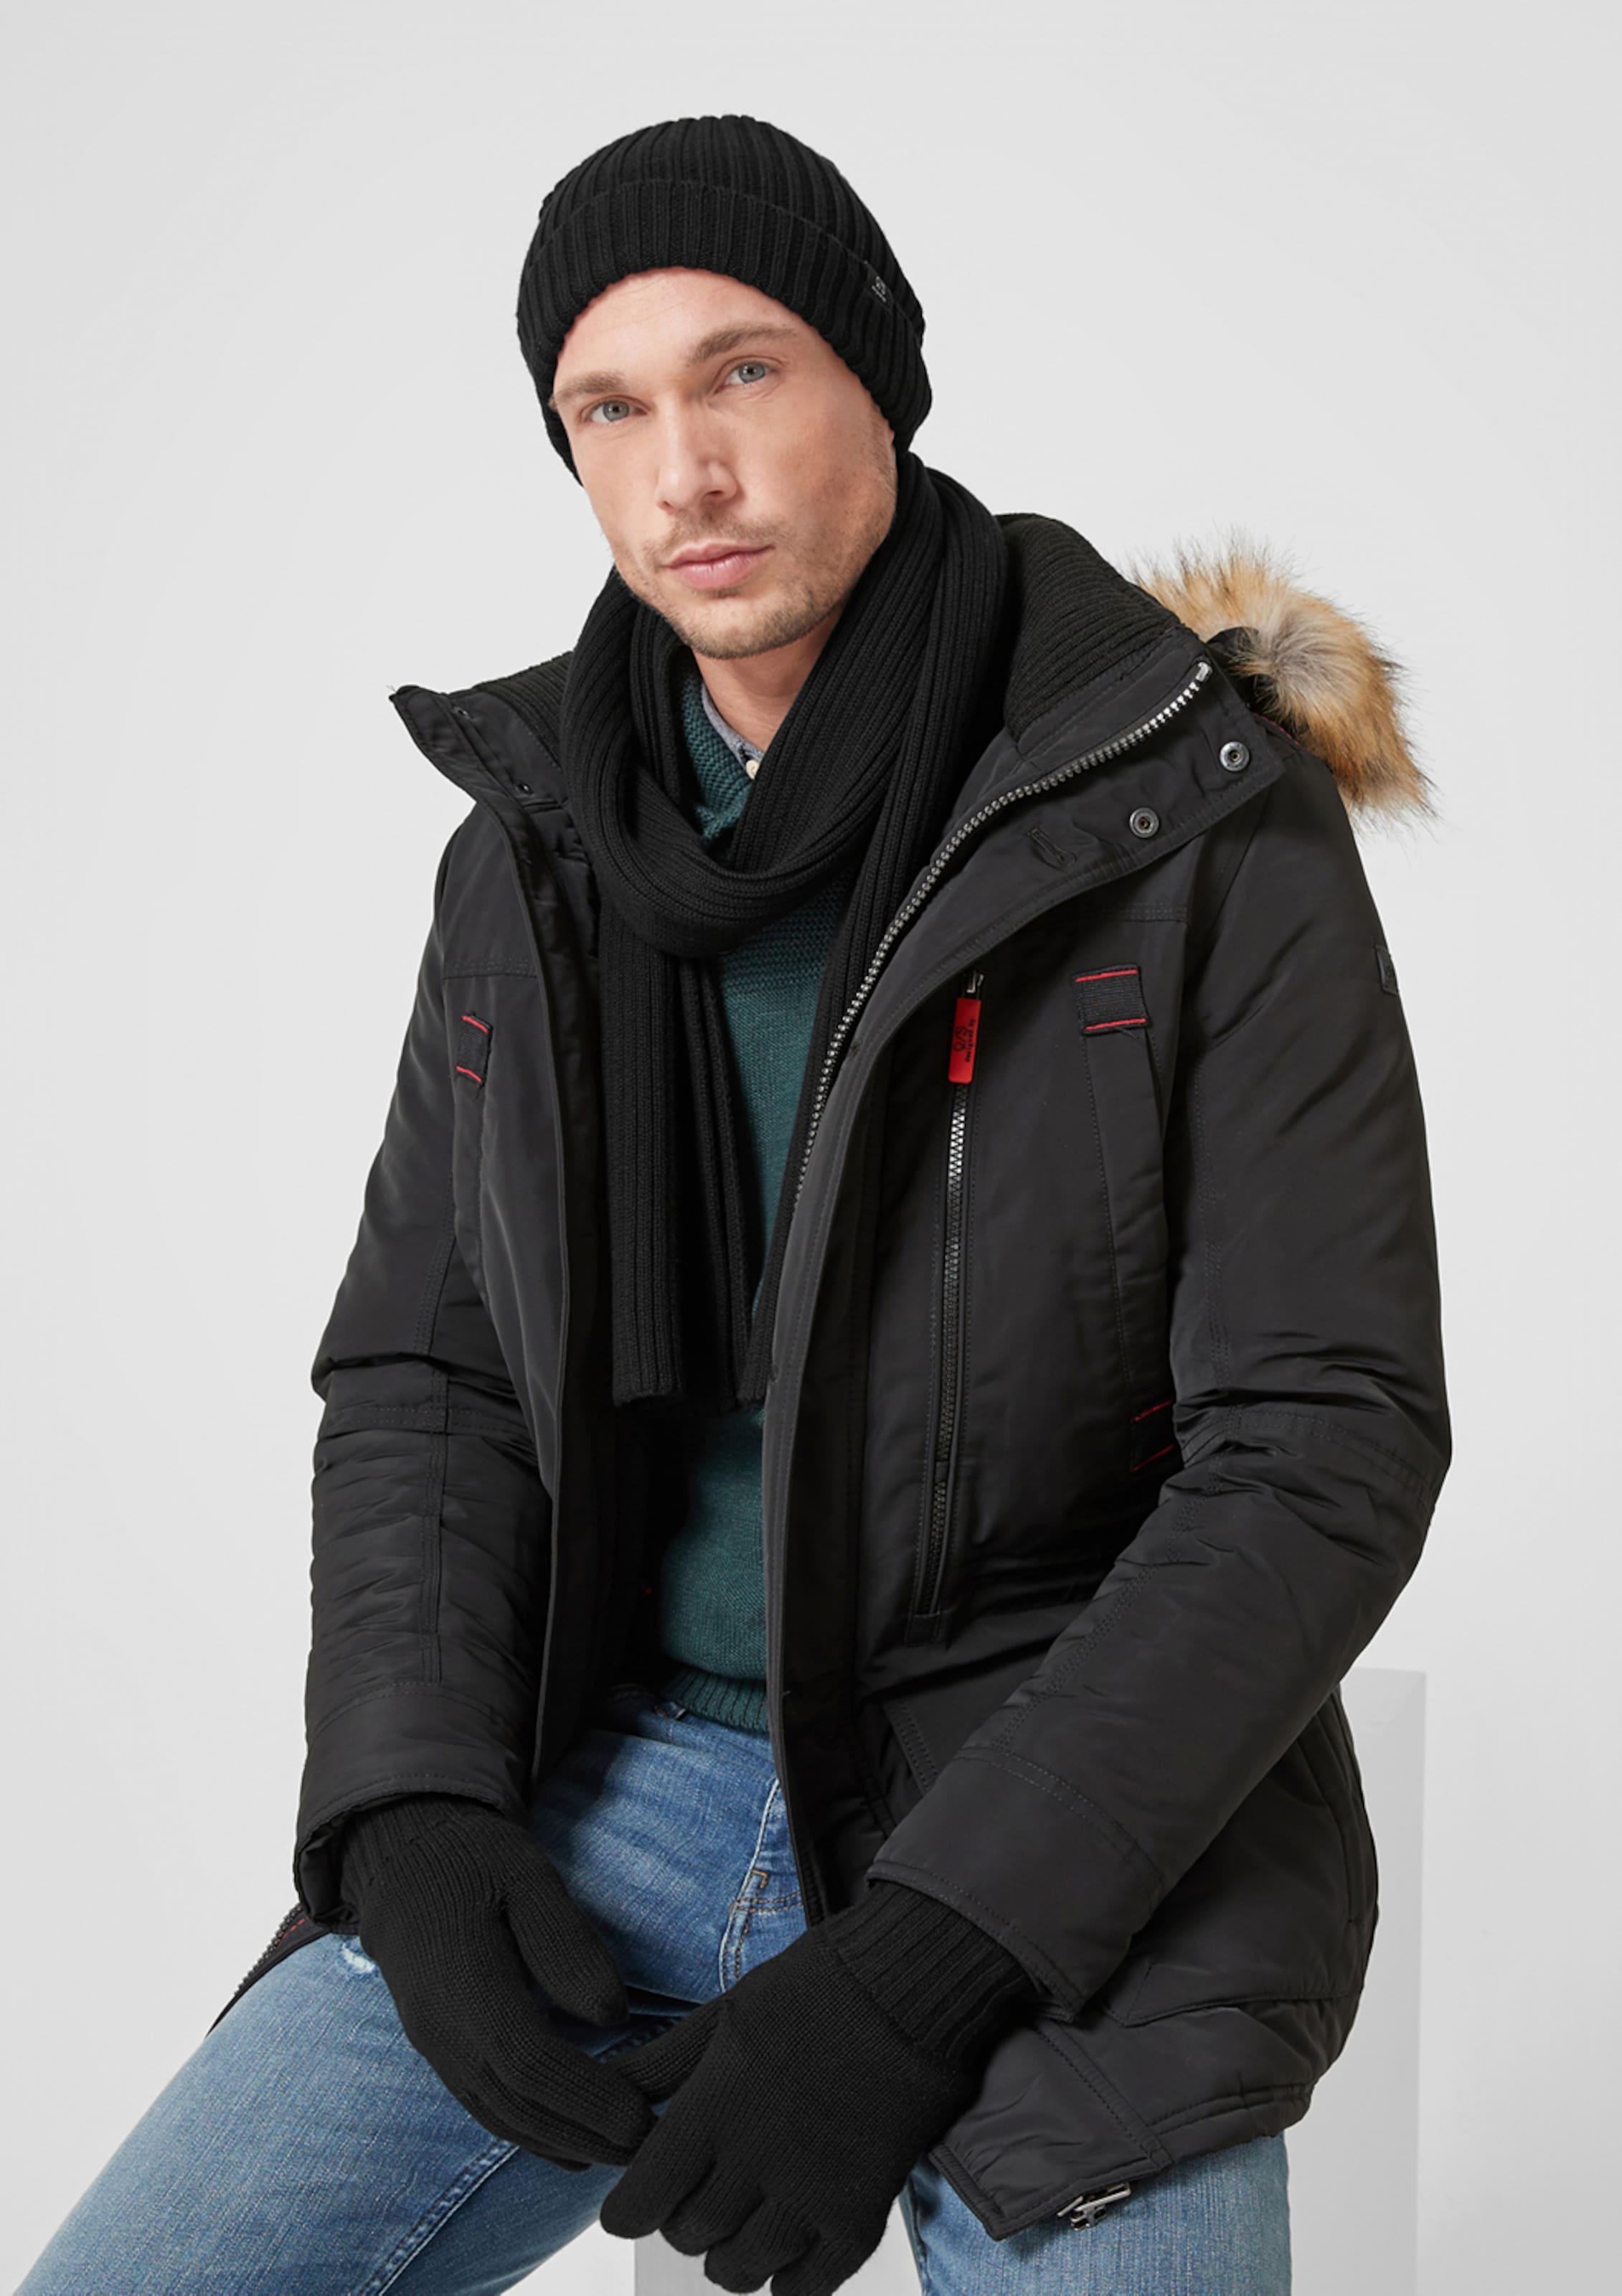 Schwarz Handschuhe Designed In Q s By uJ5FTK1c3l